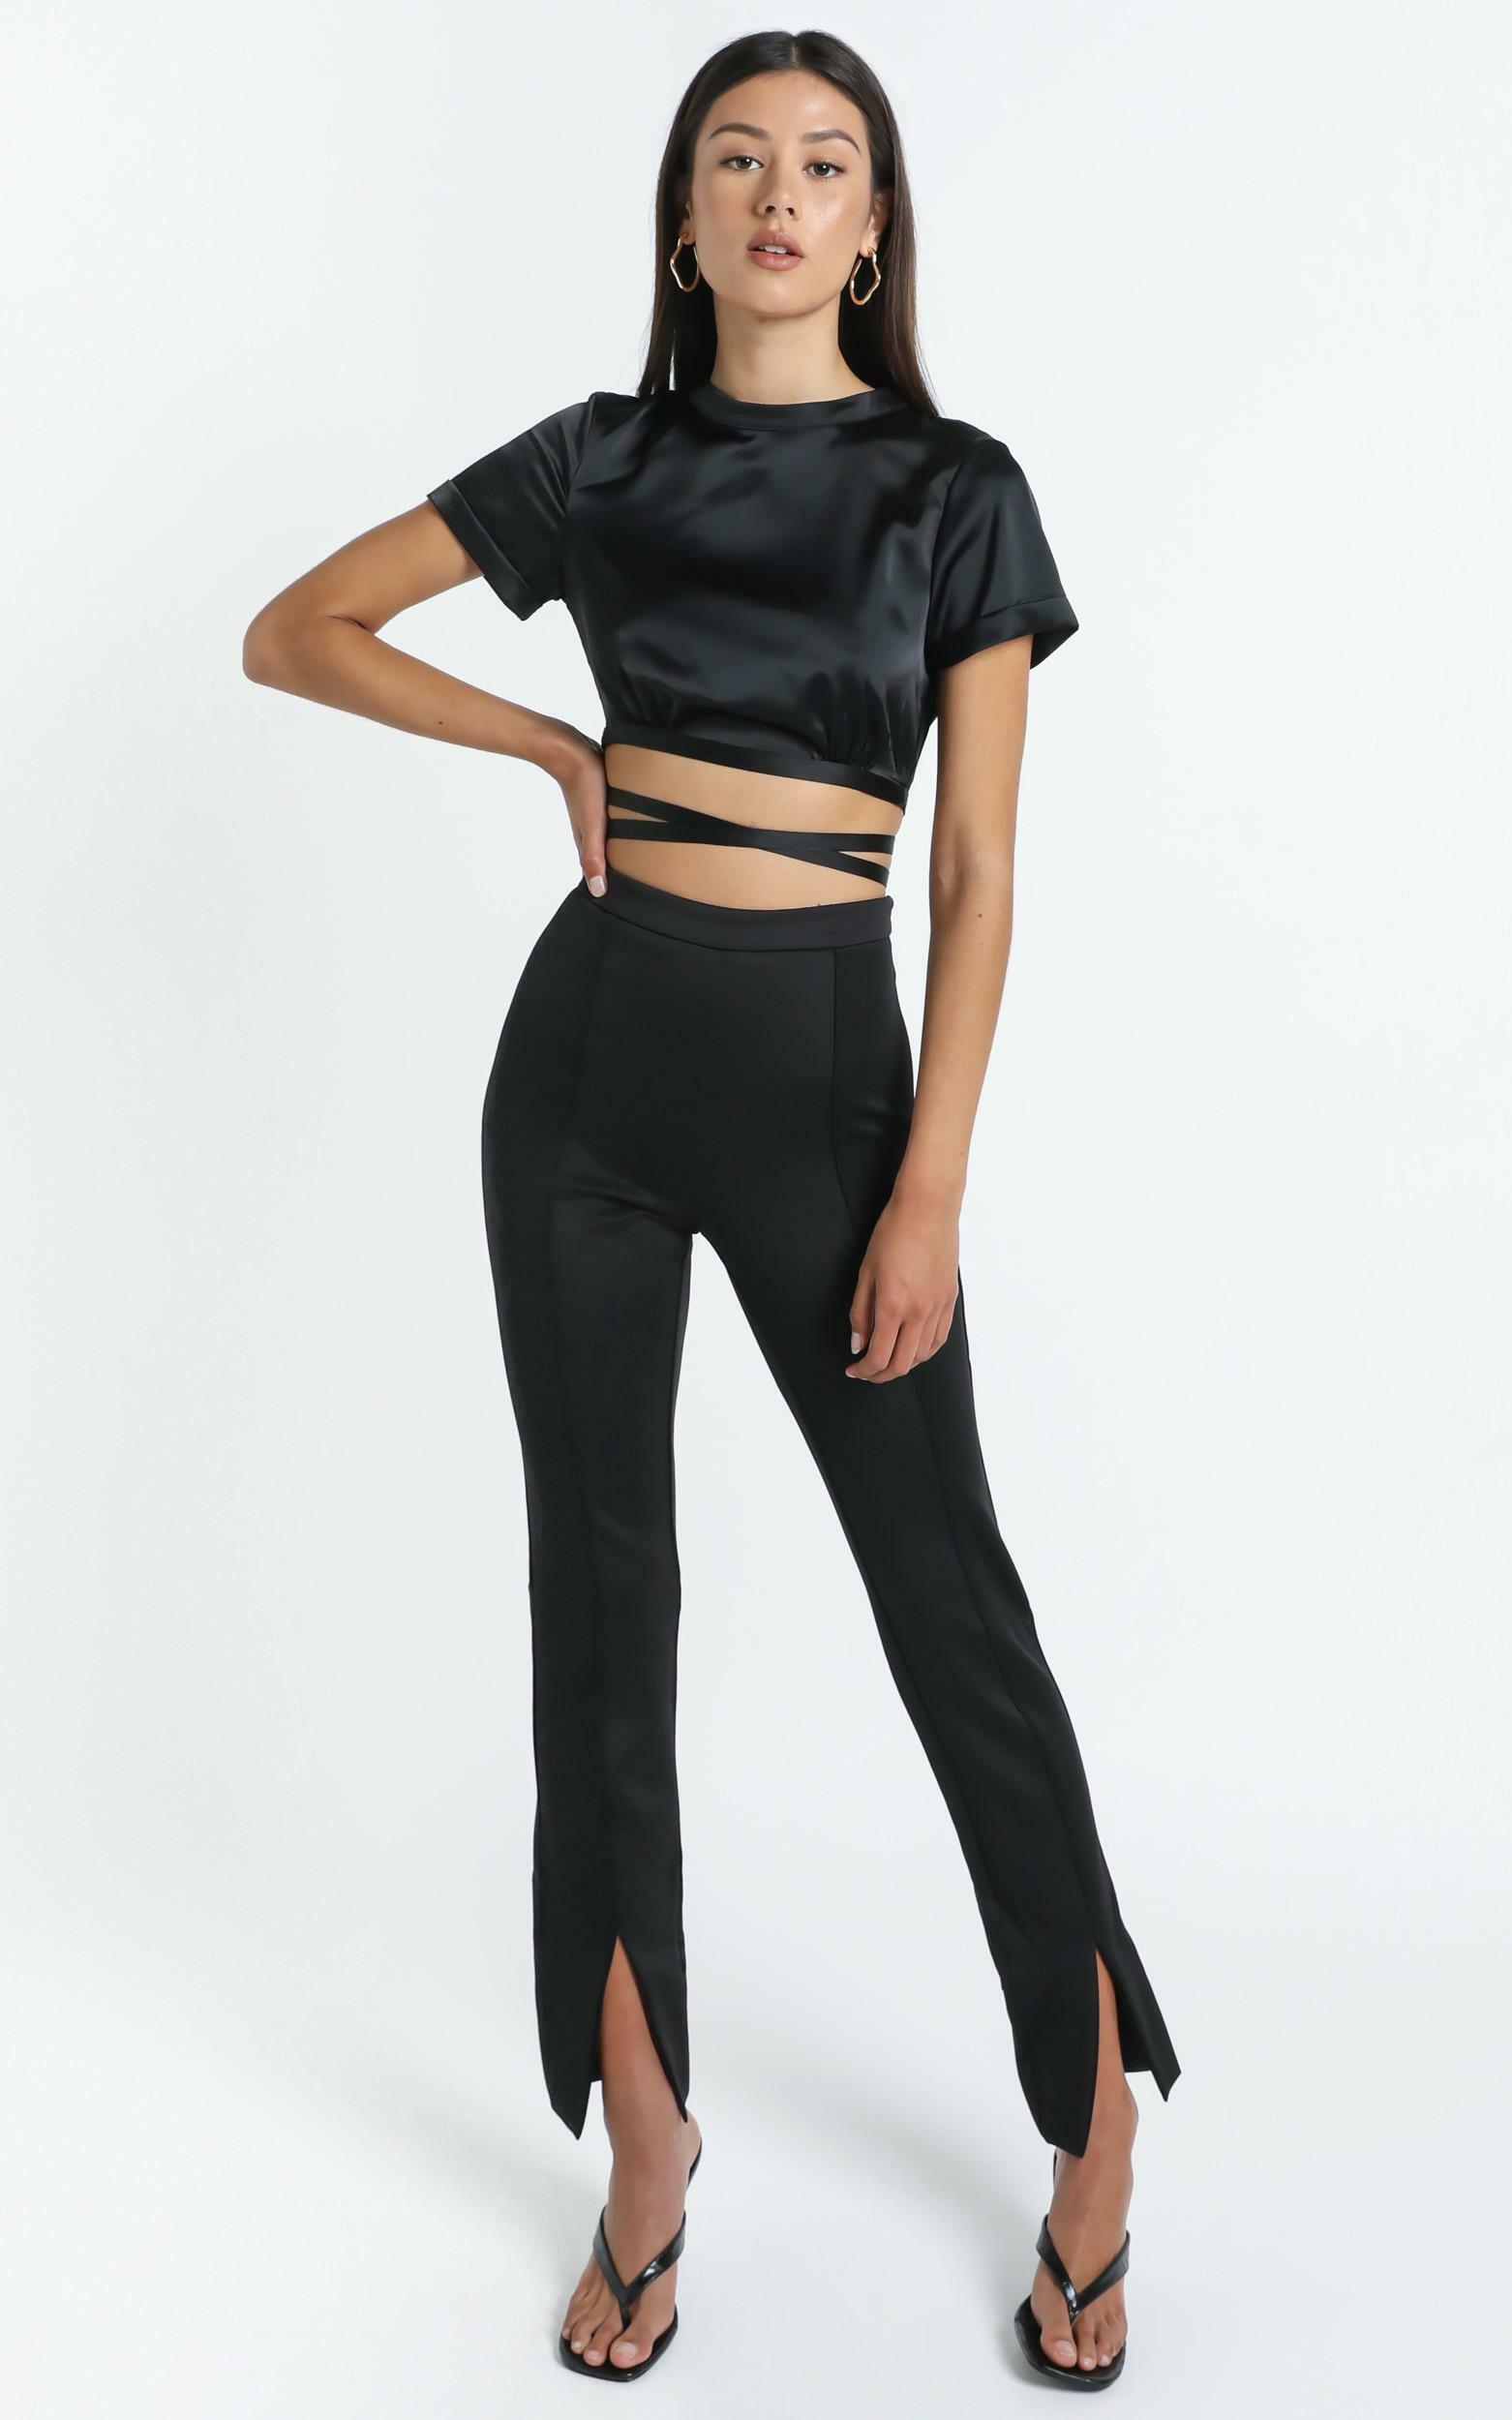 Laylin Pants in Black - 14 (XL), Black, hi-res image number null